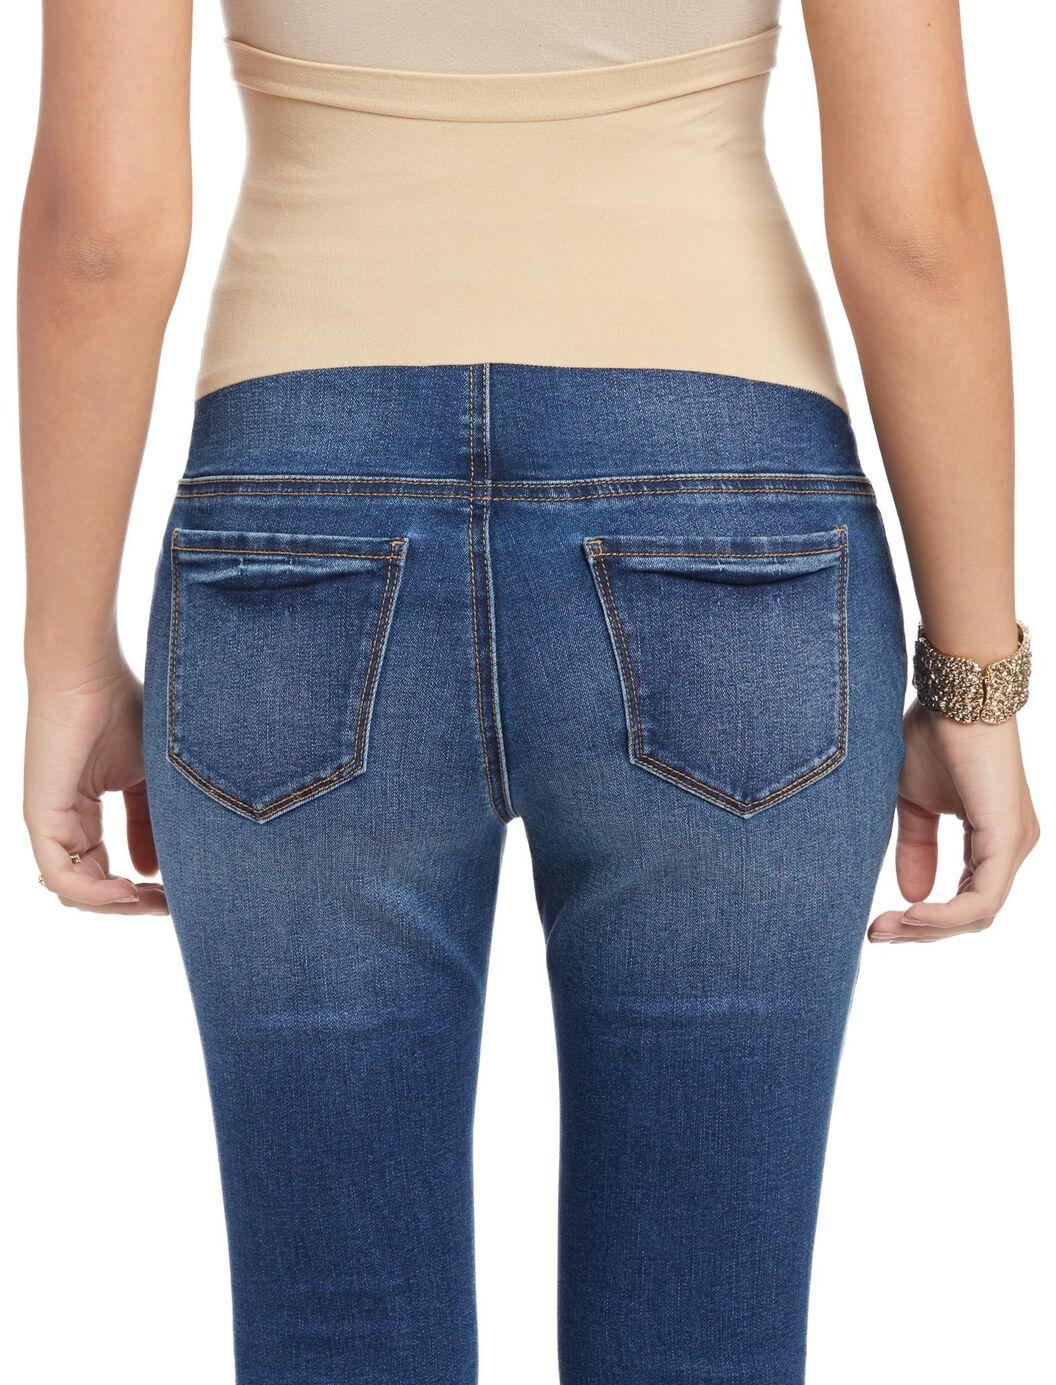 ... Indigo Blue Secret Fit Belly Flare Maternity Jeans, Medium Wash - Indigo Blue Secret Fit Belly Flare Maternity Jeans Motherhood